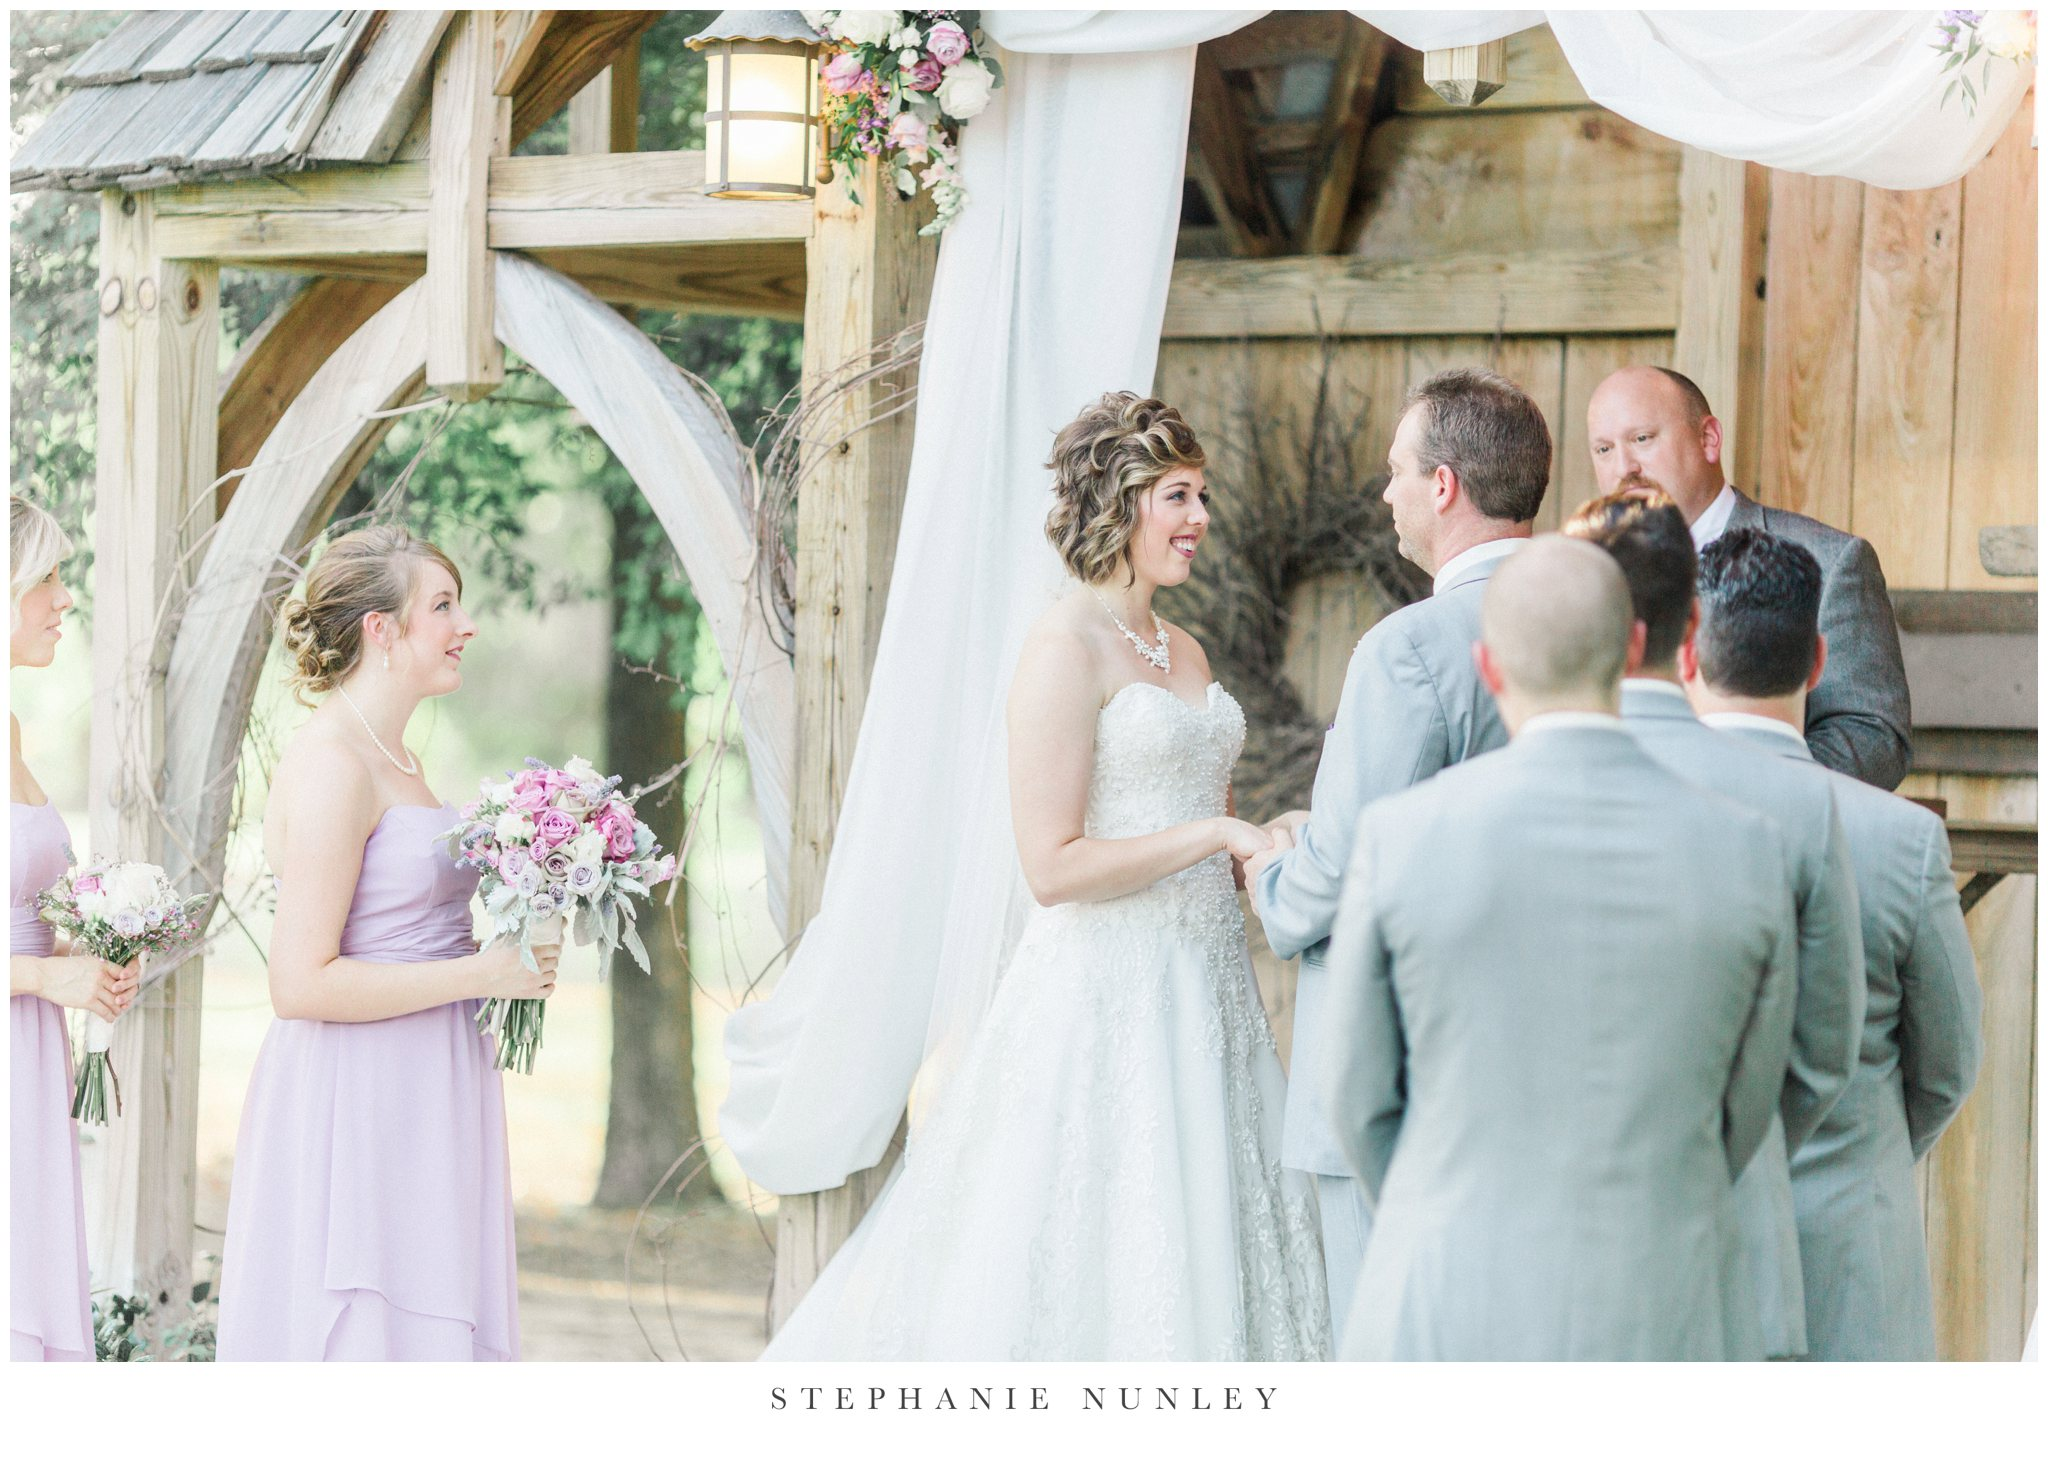 southern-classy-outdoor-barn-wedding-photos-0080.jpg